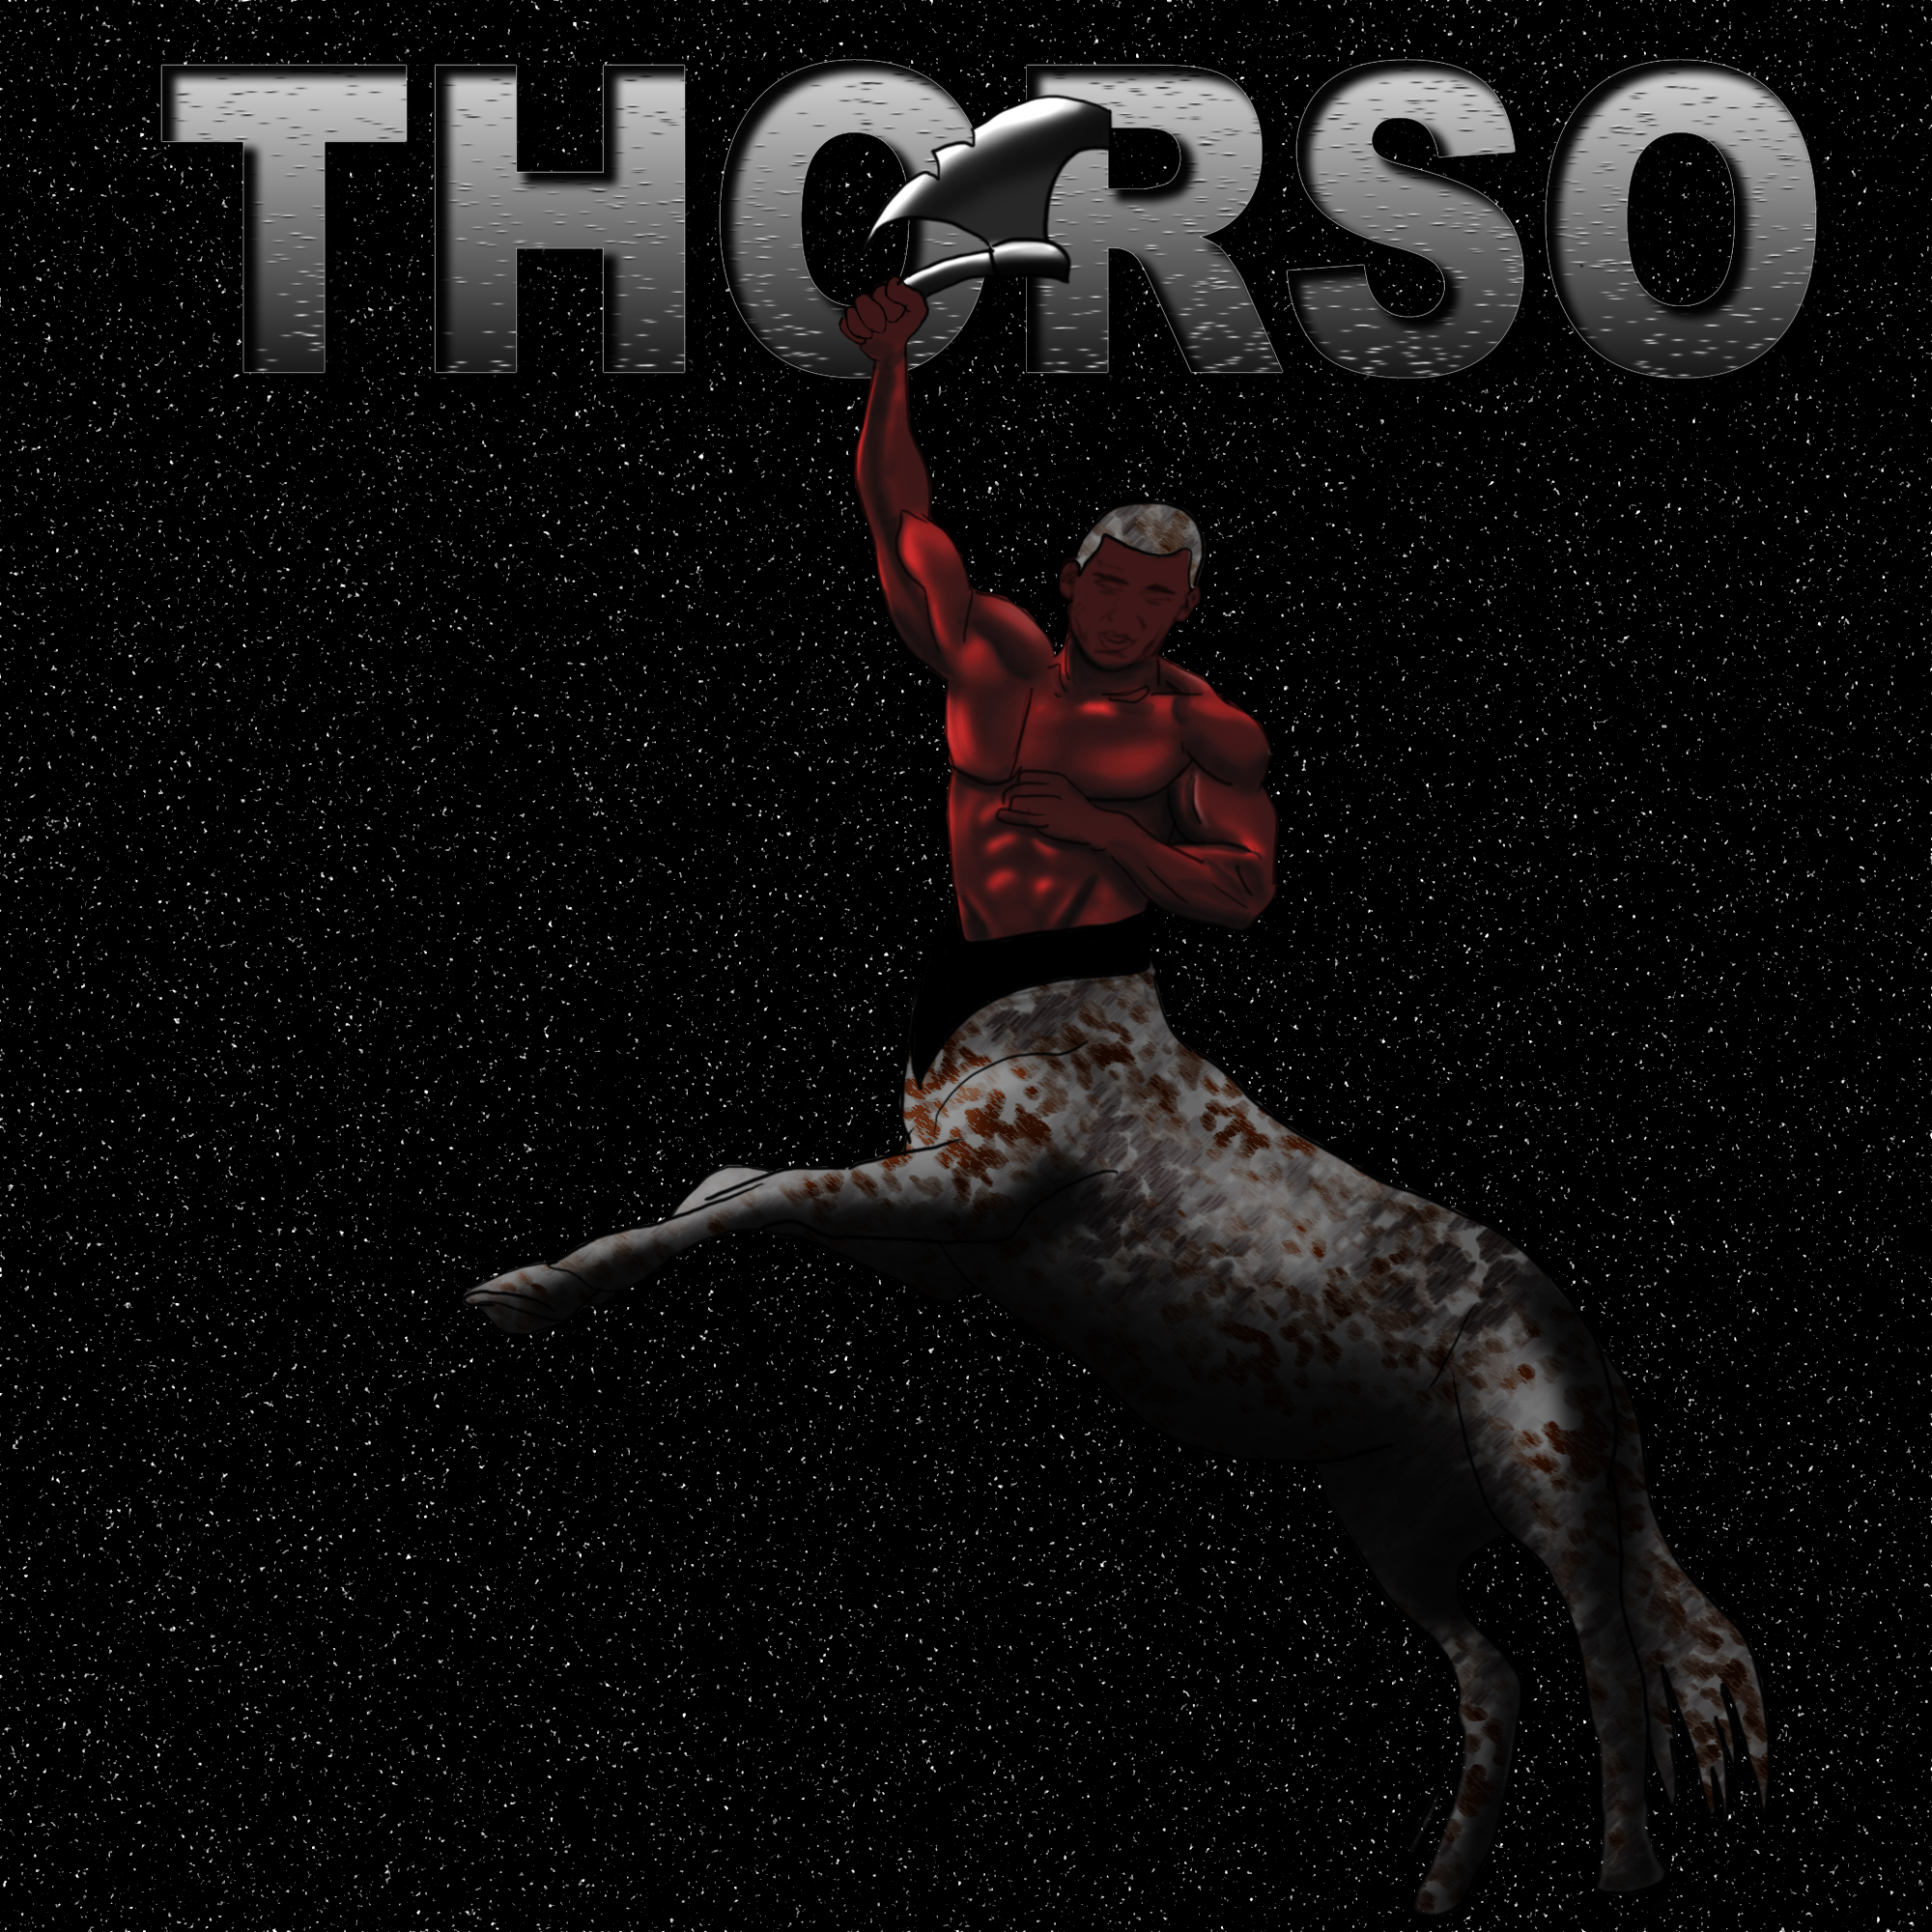 Thorso